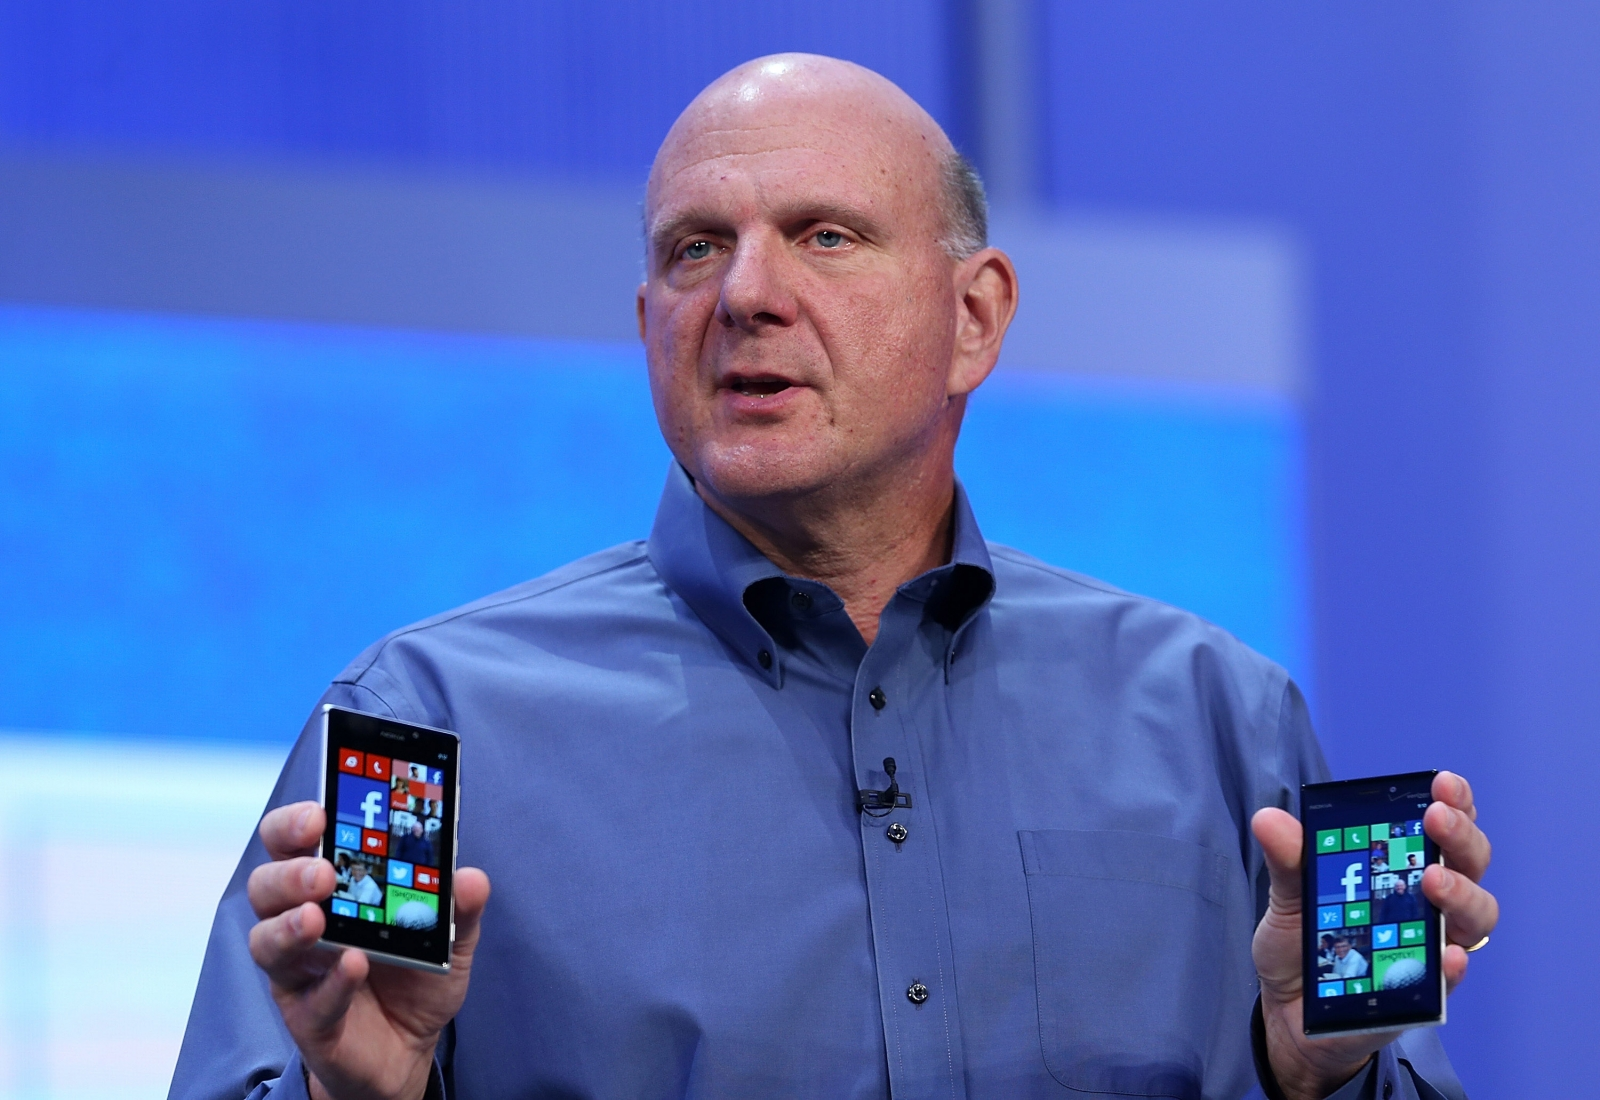 Steve Ballmer talks about Microsoft's hardware capabilities